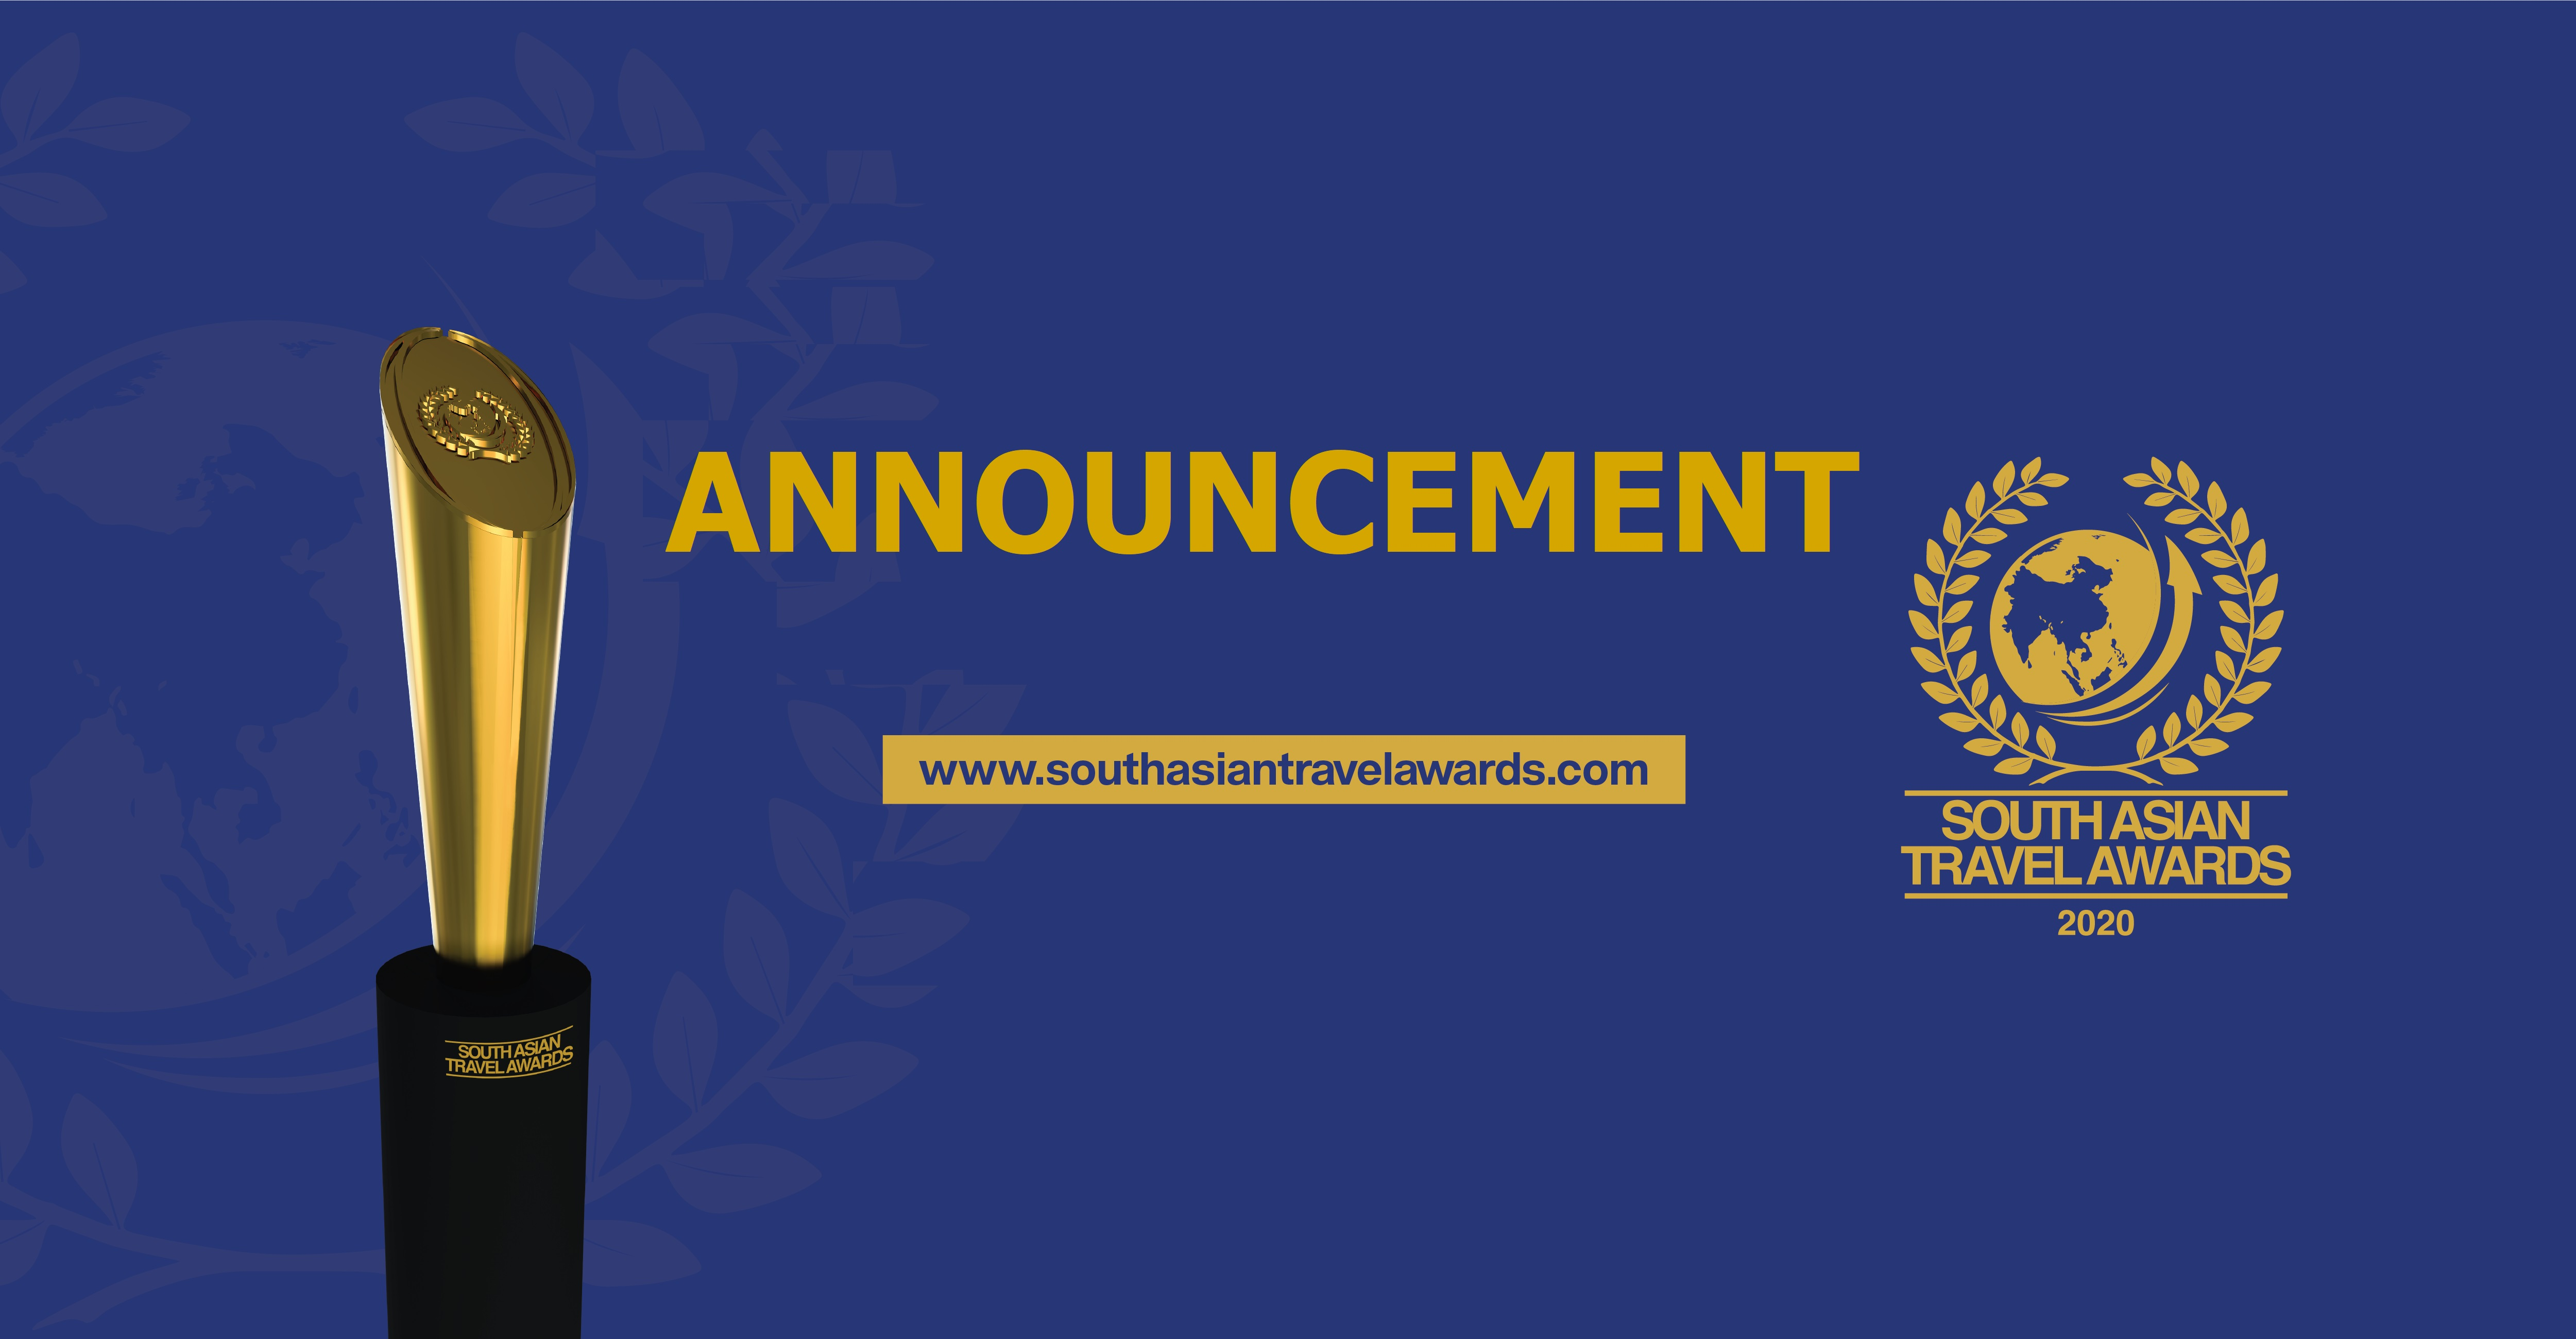 SATA postpones Jury Evaluations due to Global Health Crisis